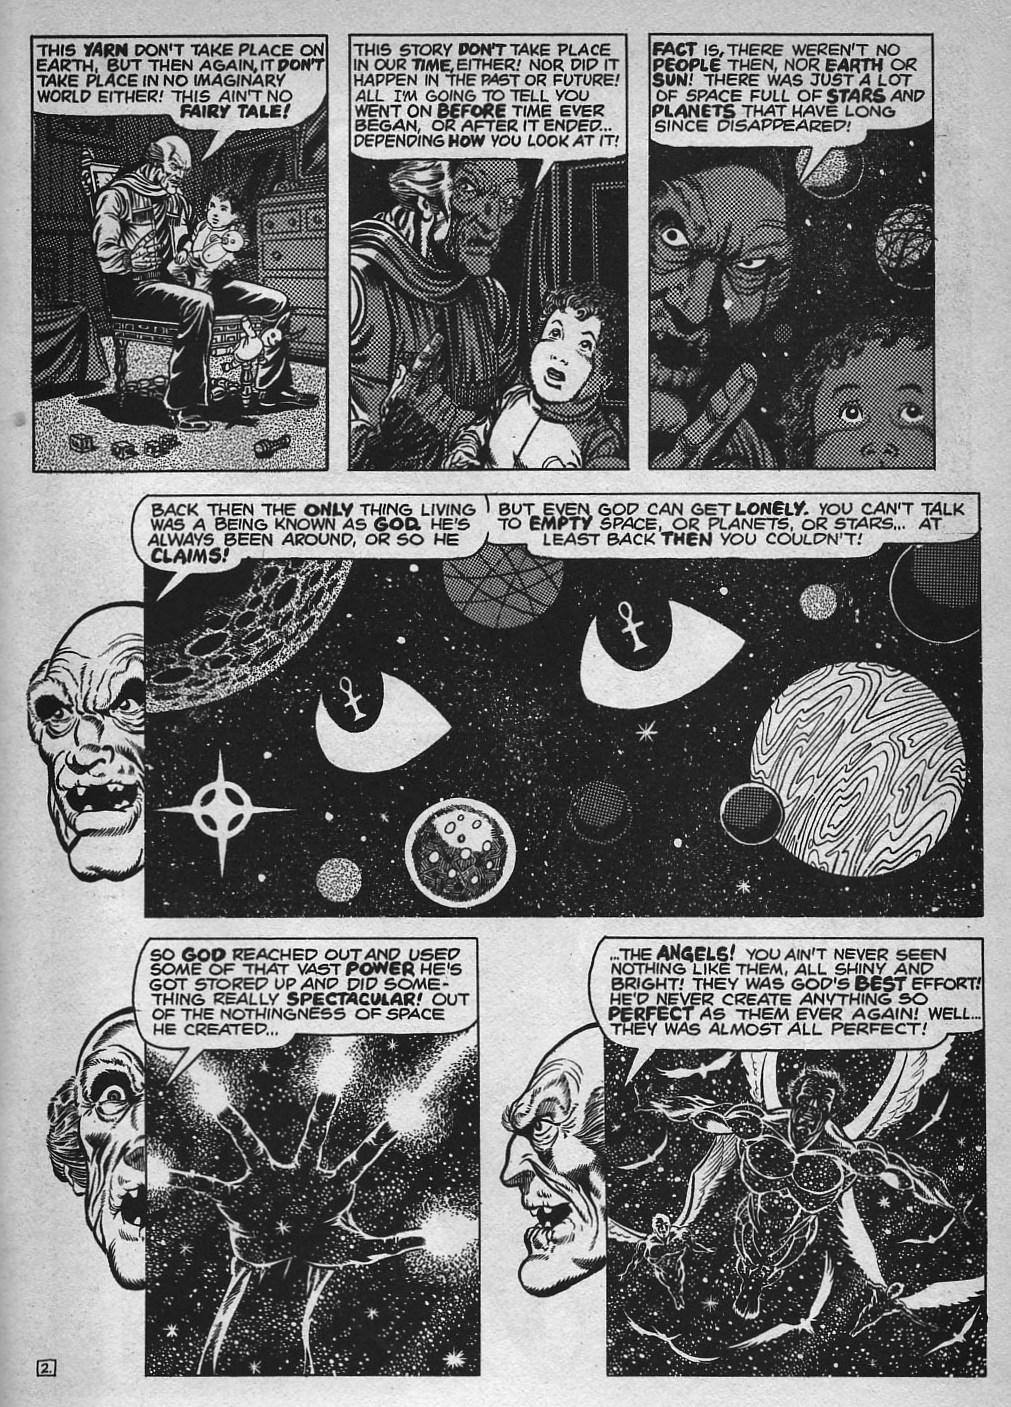 StarReach01-4-43